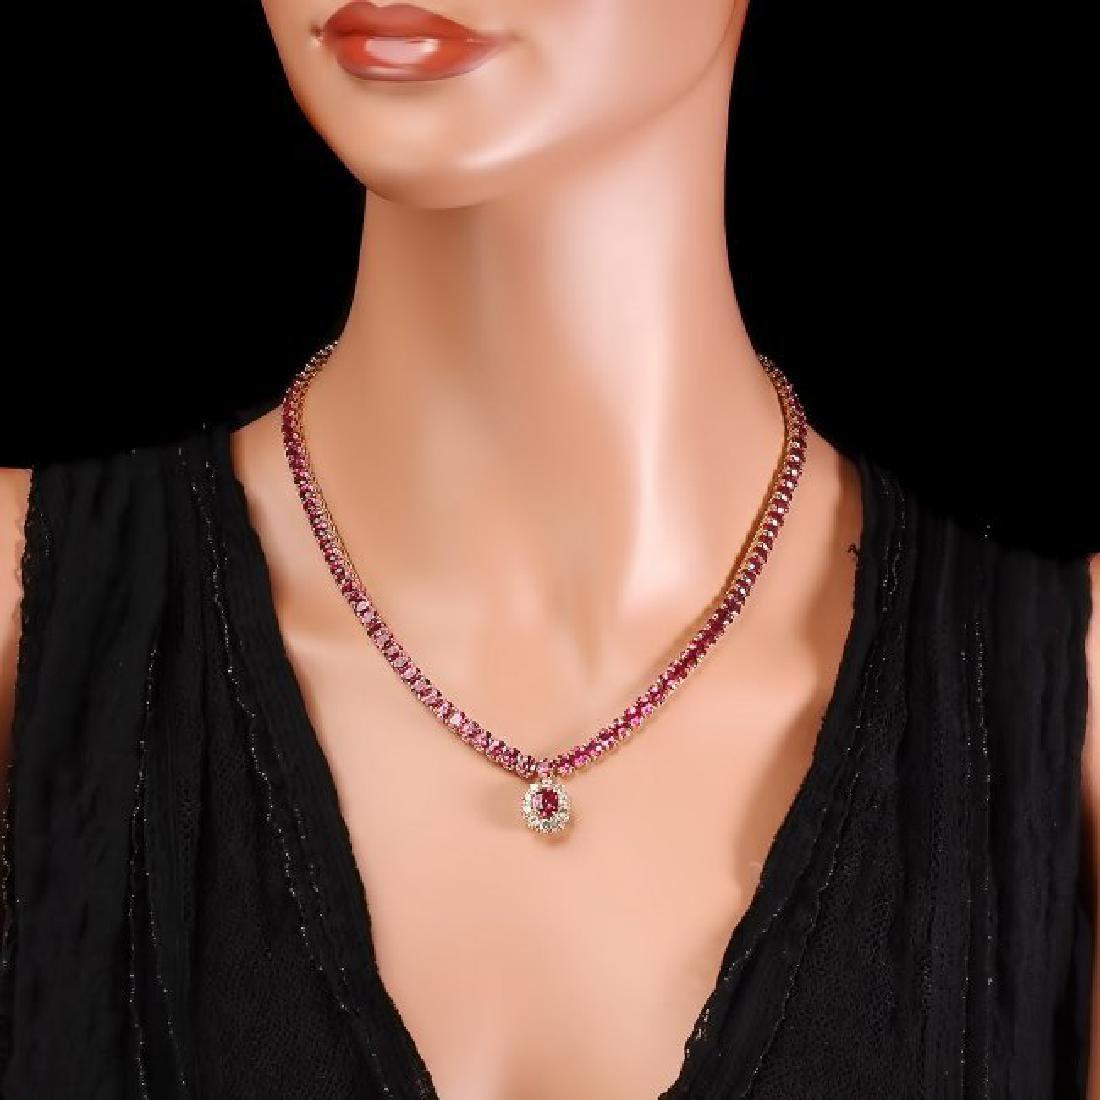 14k Gold 40ct Tourmaline 1ct Diamond Necklace - 5